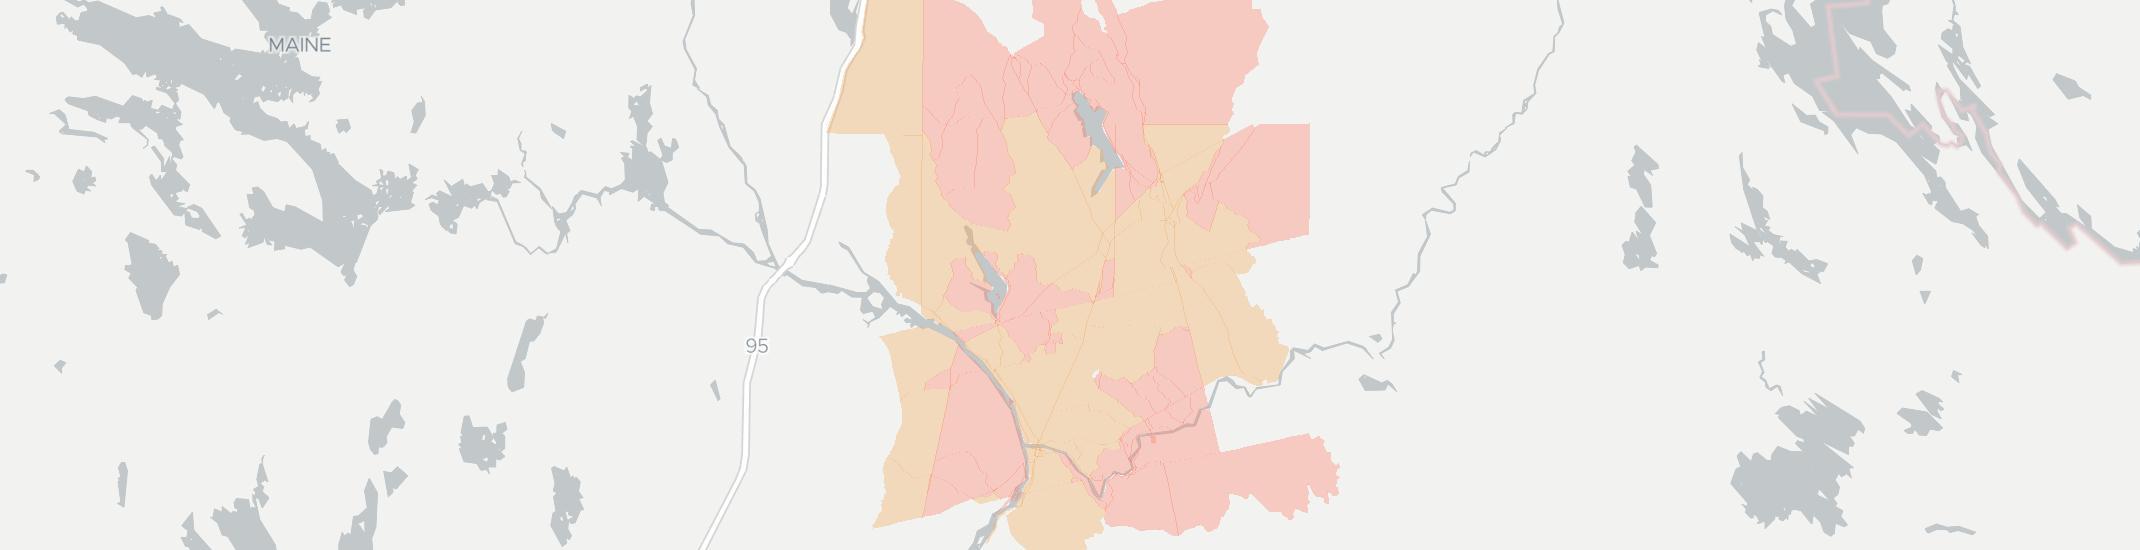 Mattawamkeag Internet Competition Map. Click for interactive map.